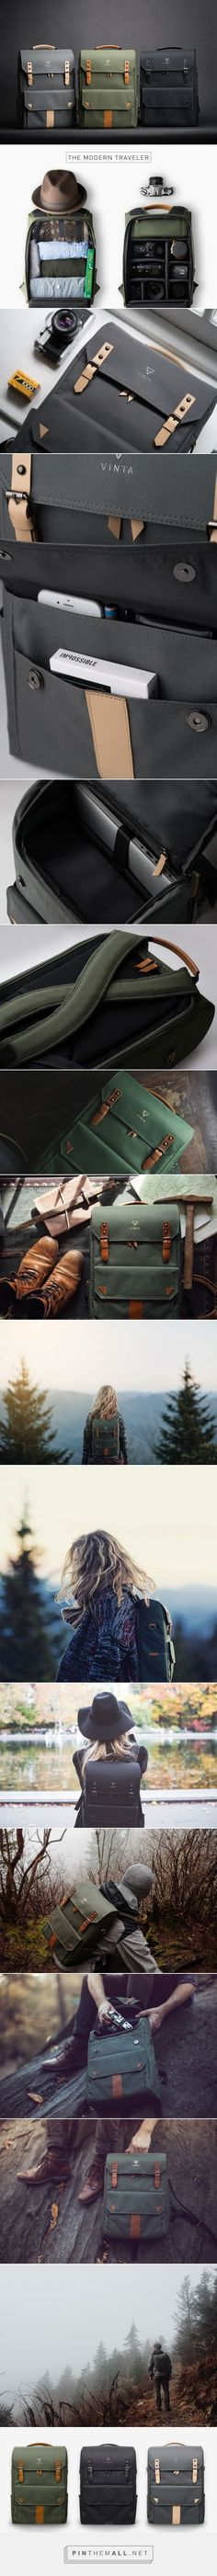 A Travel